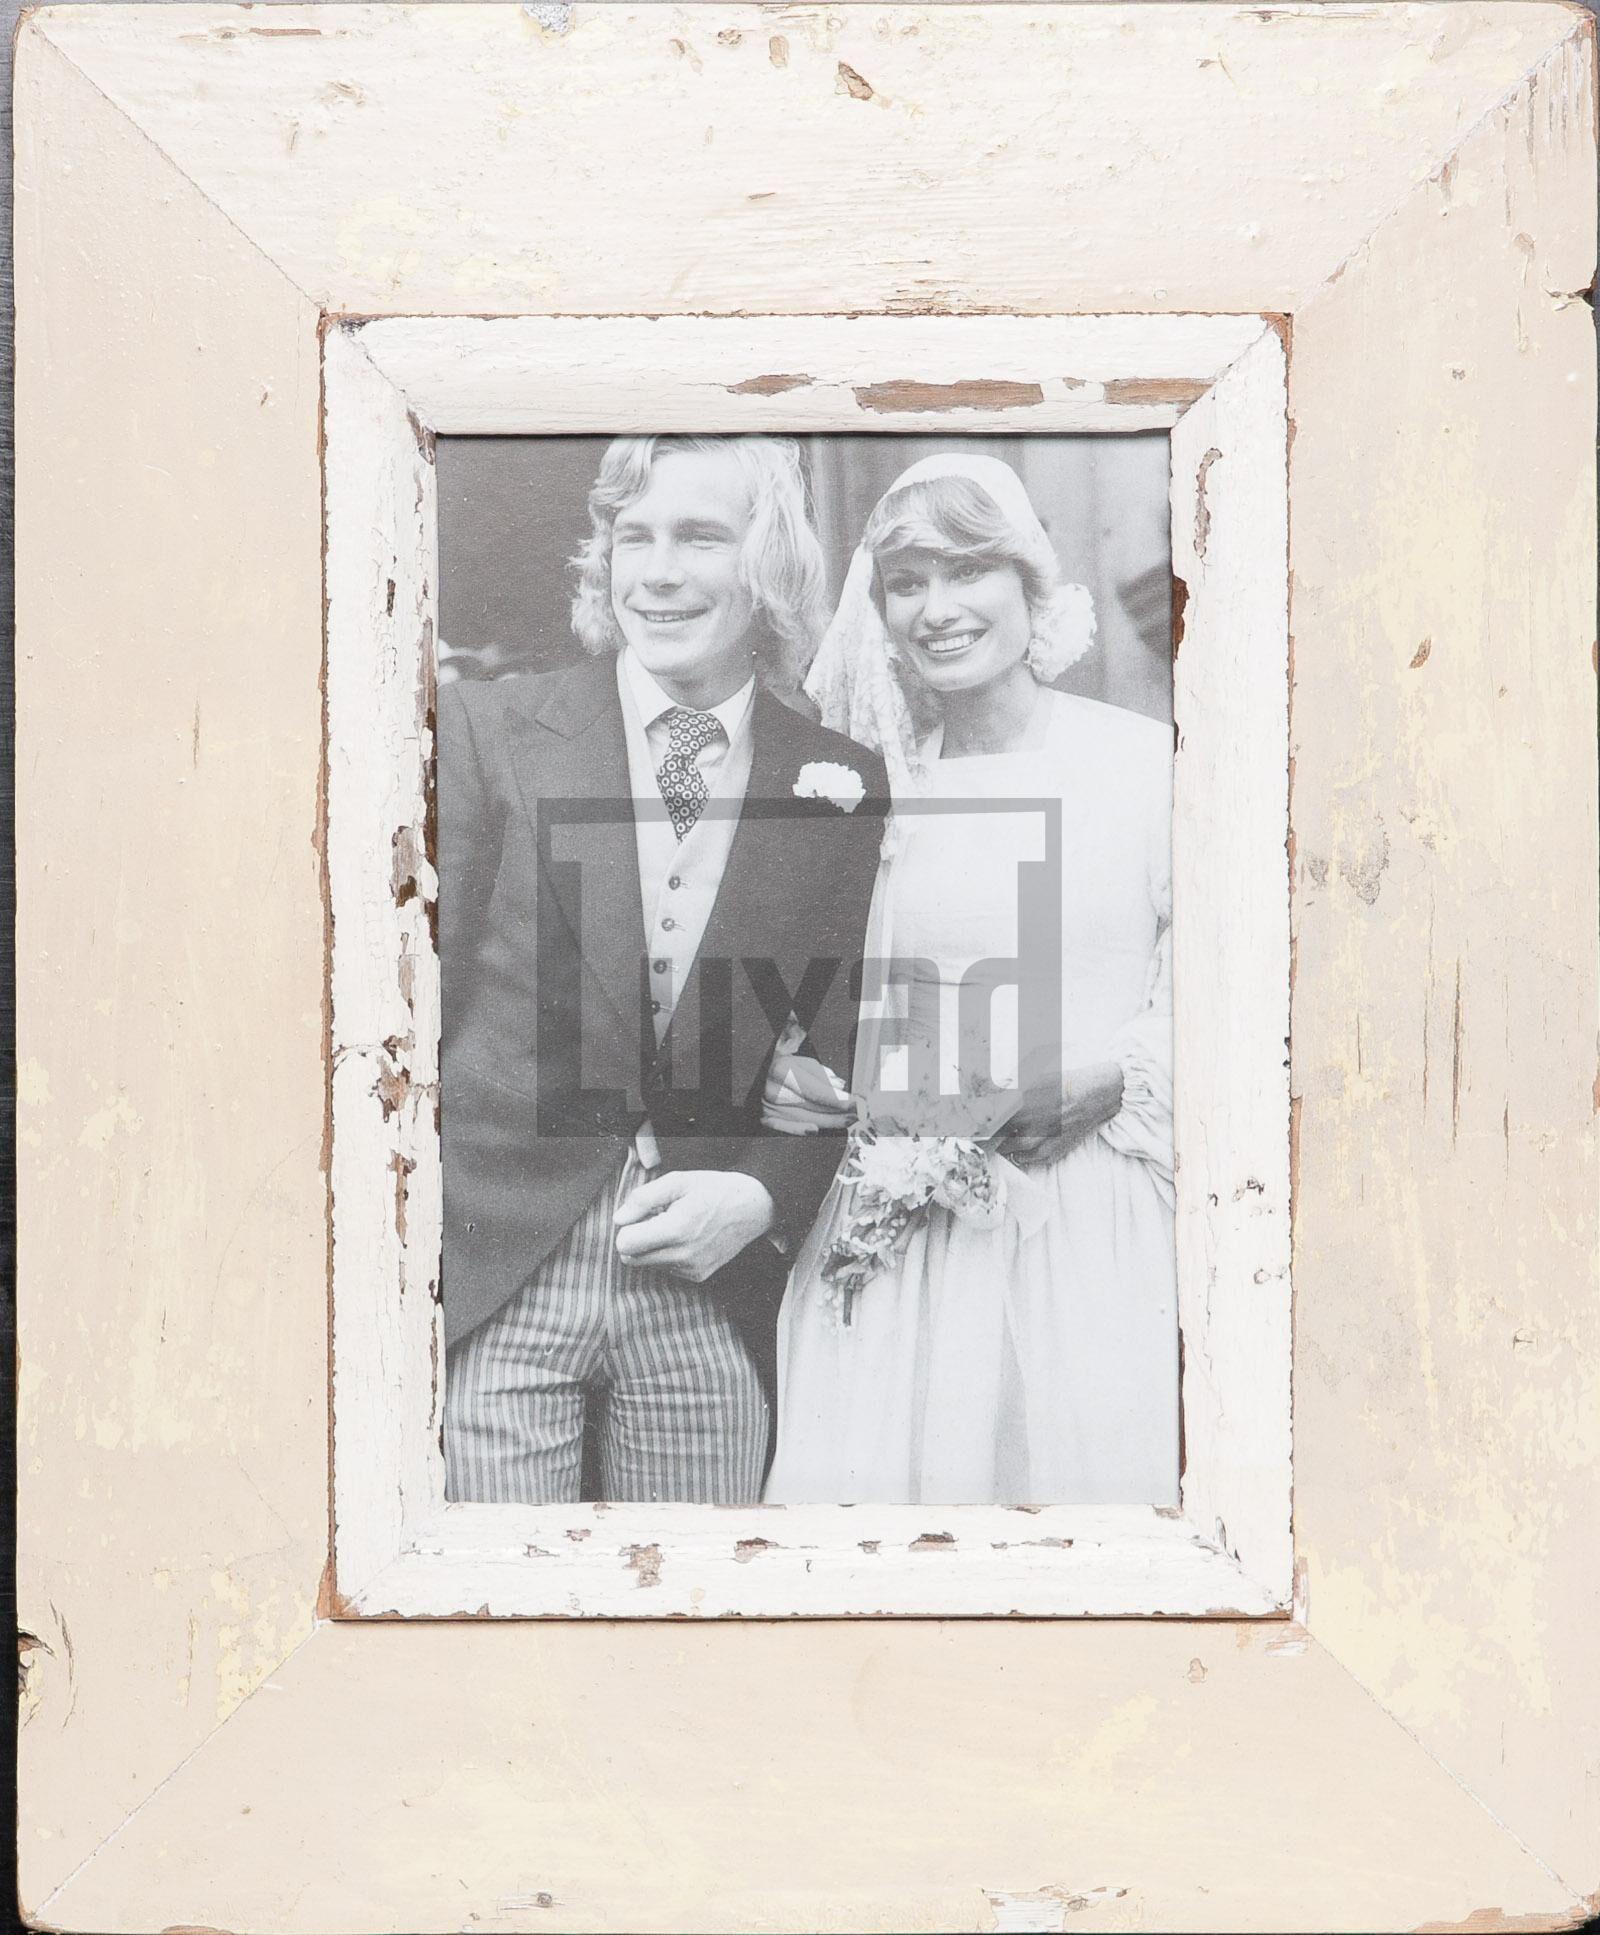 Vintage-Fotorahmen aus recyceltem Holz für ca. 14,8 x 21 cm